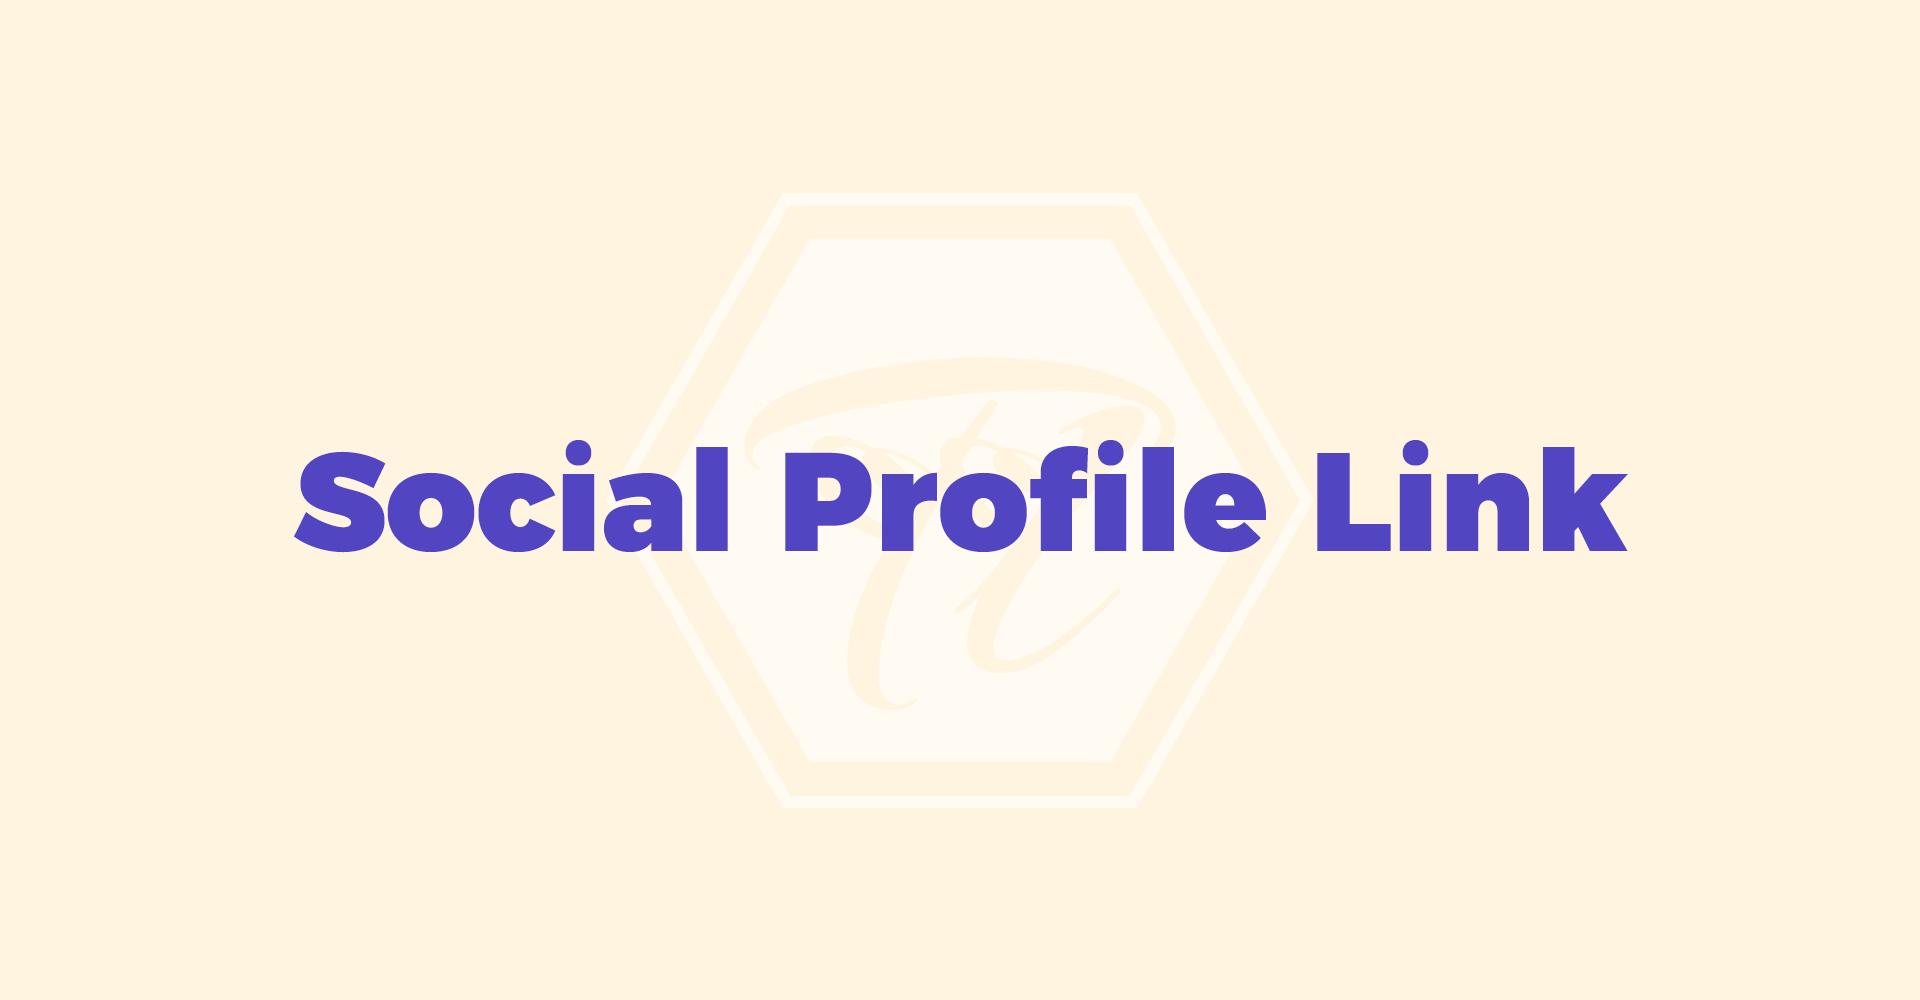 social_profile_link 1 1